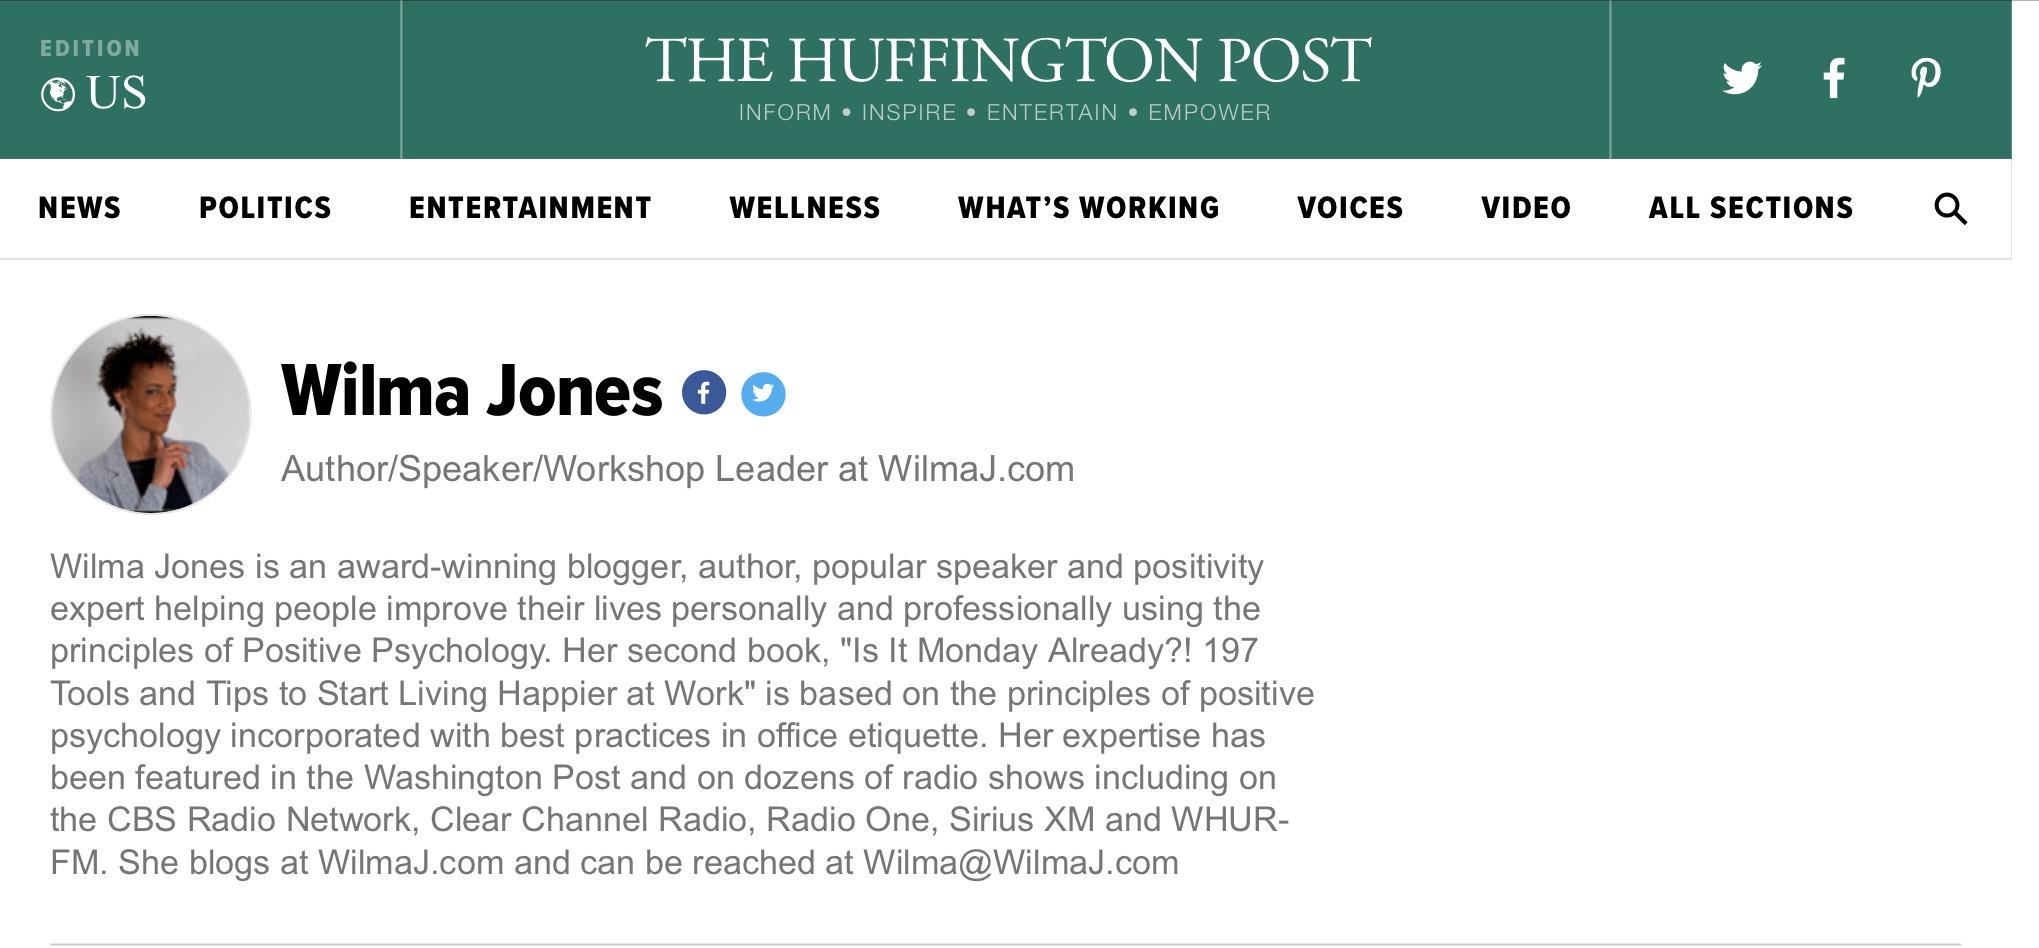 wilma jones huff post page link